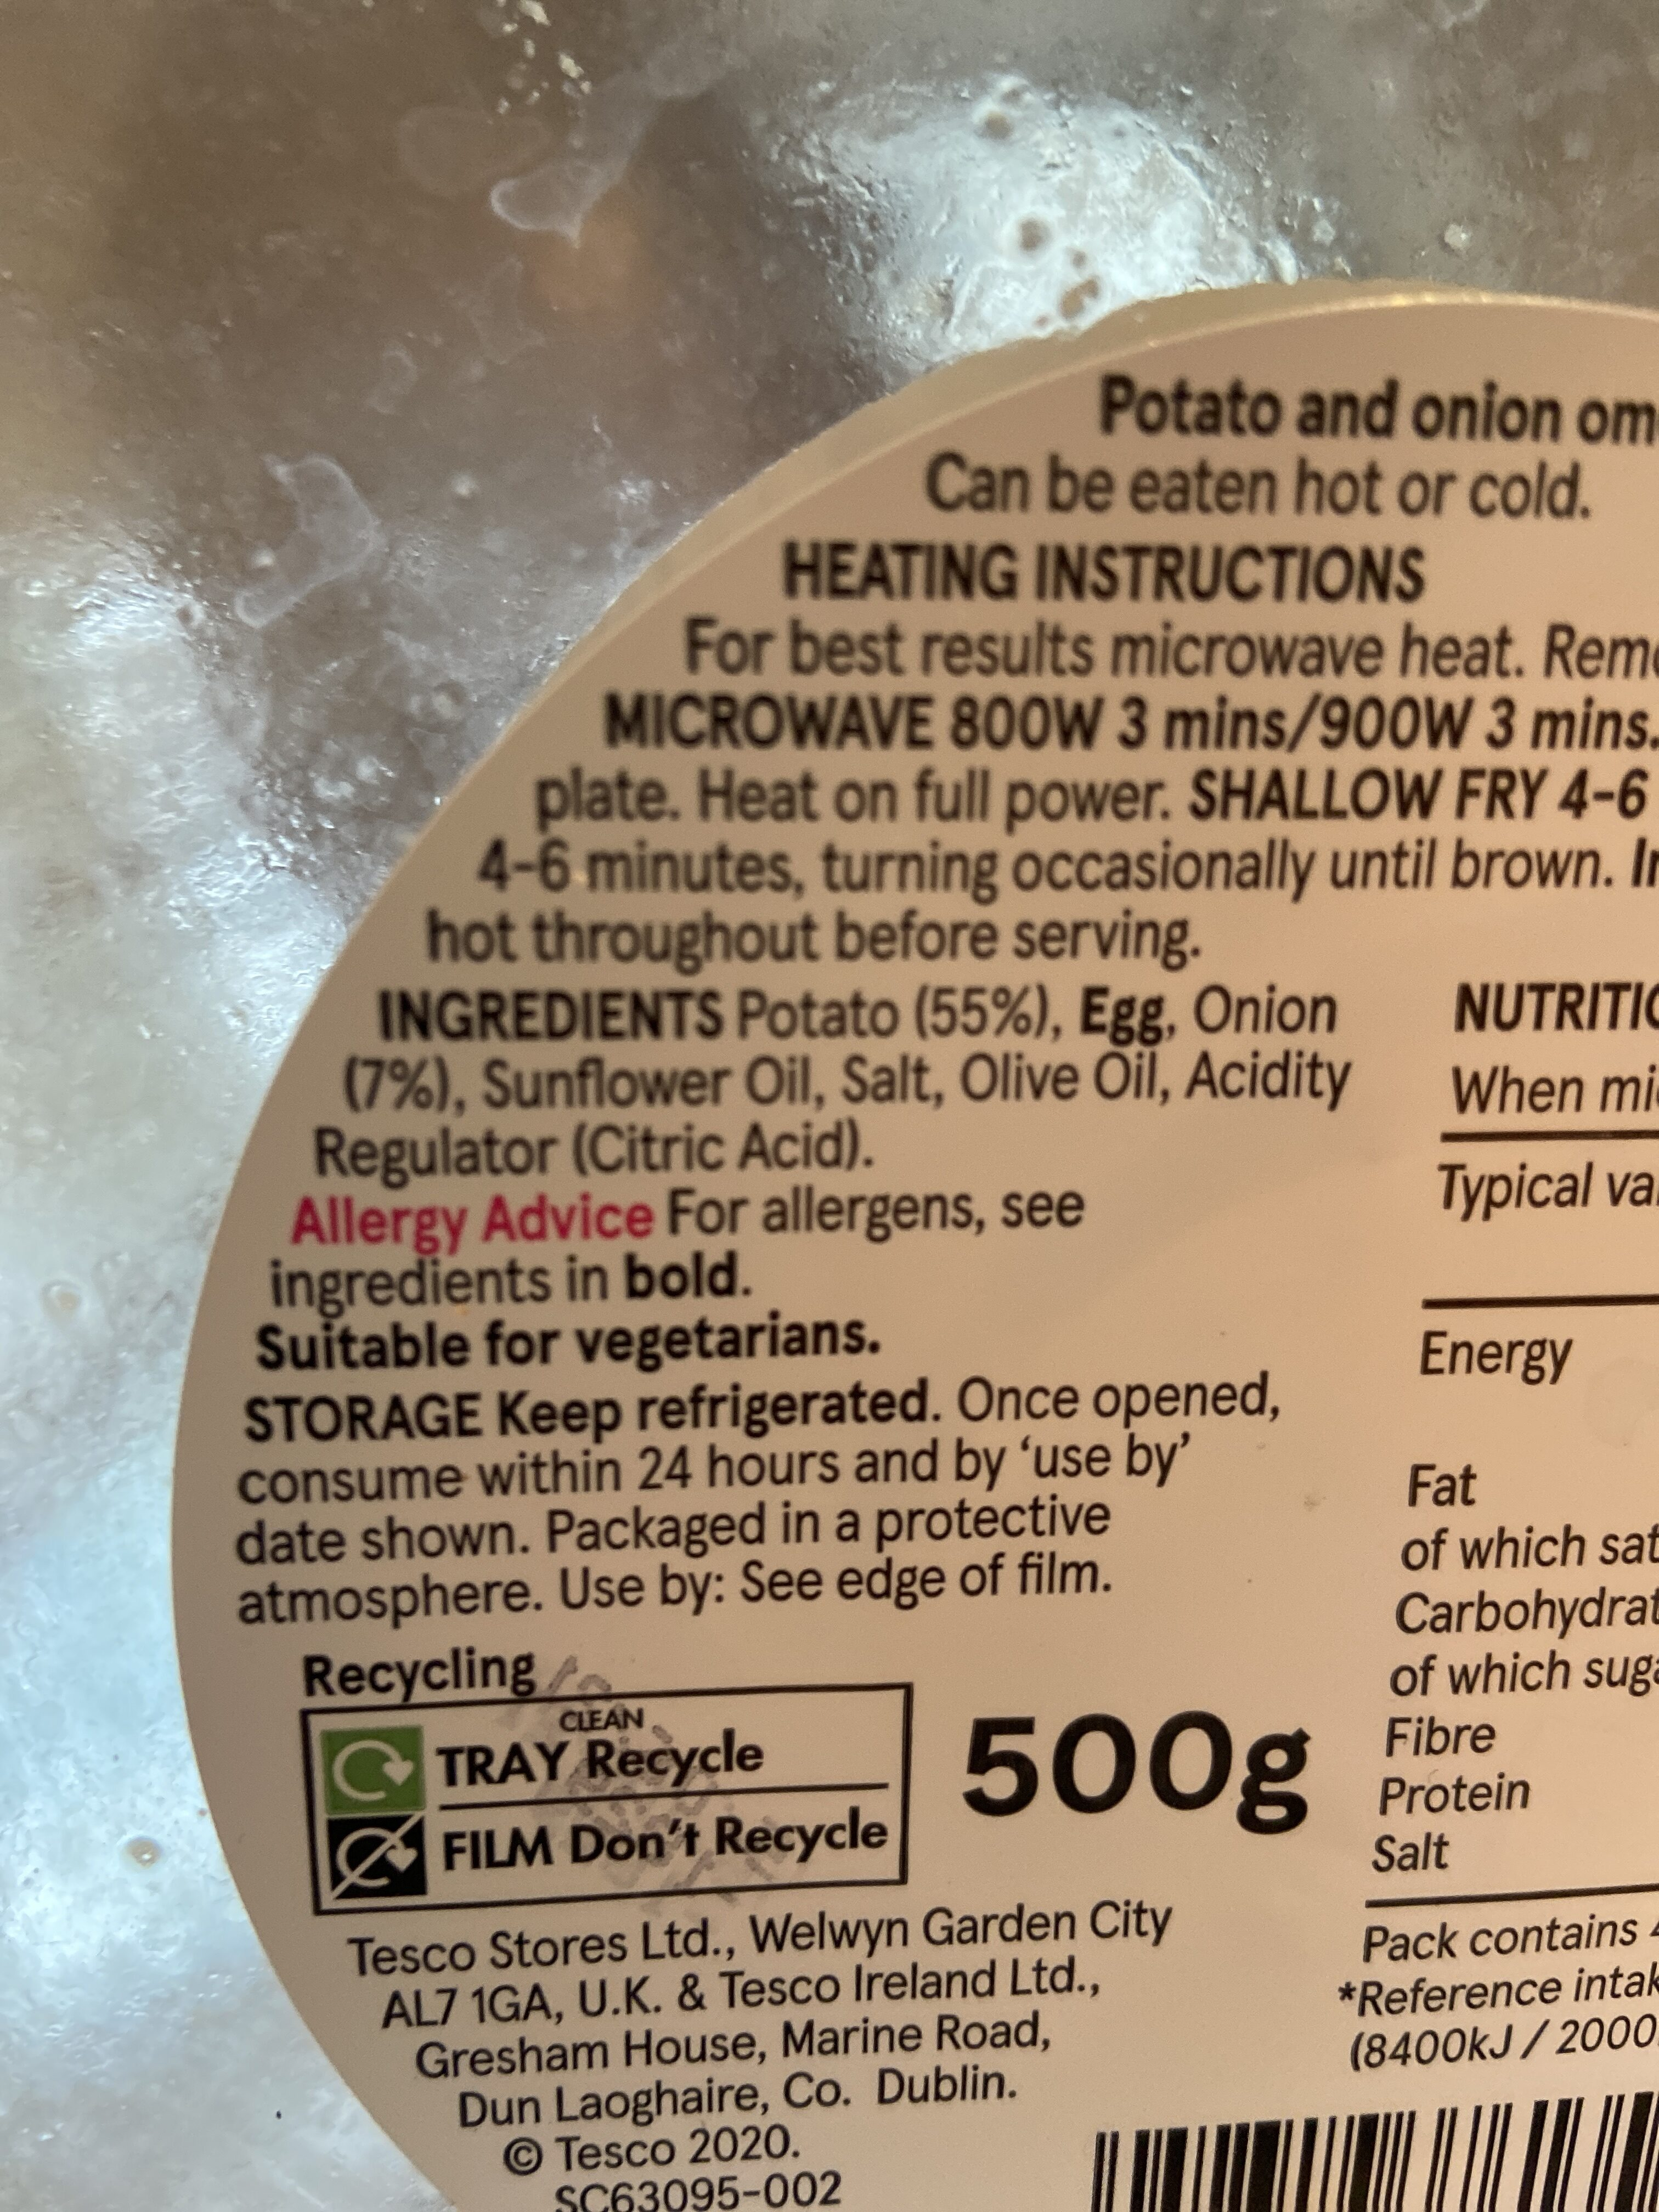 Spanish Potato And Onion Omelette - Ingredients - en